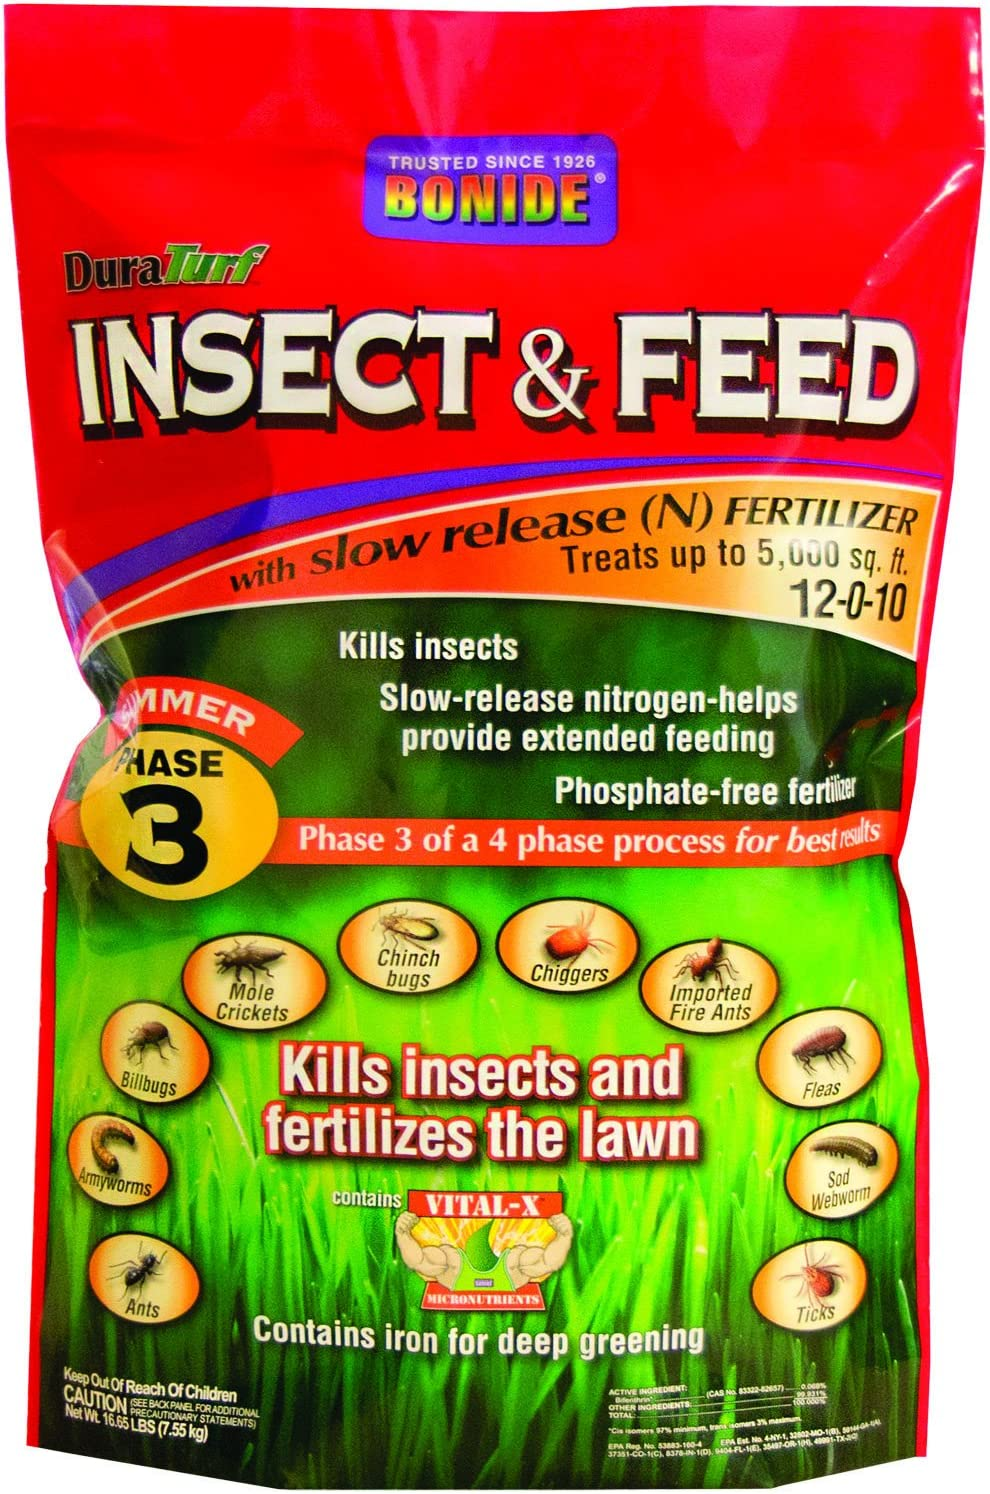 BONIDE PRODUCTS 60430 Insect Control Fertilizer, 5M